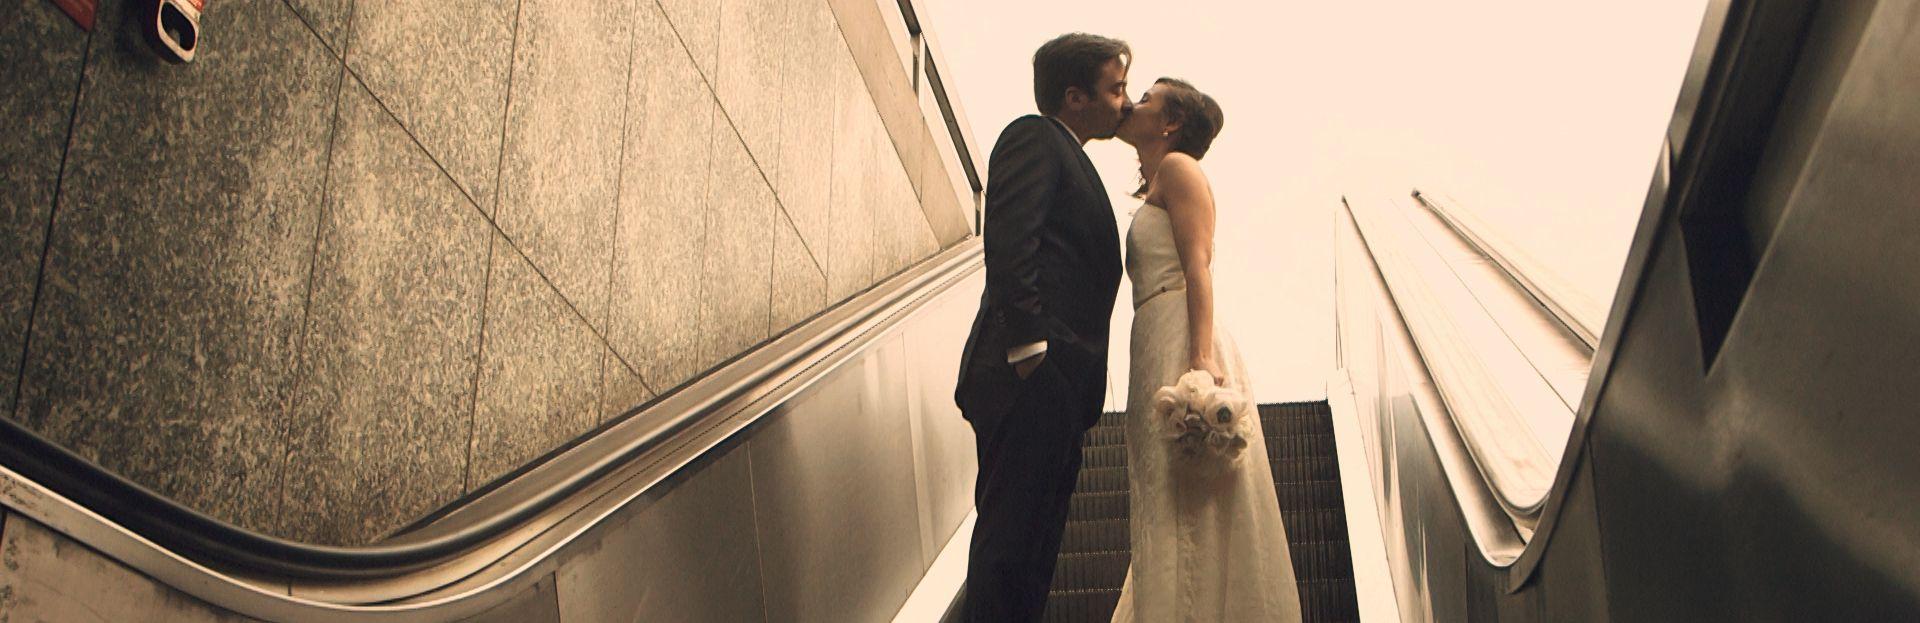 mariage, film, vidéo, caméraman, réalisateur